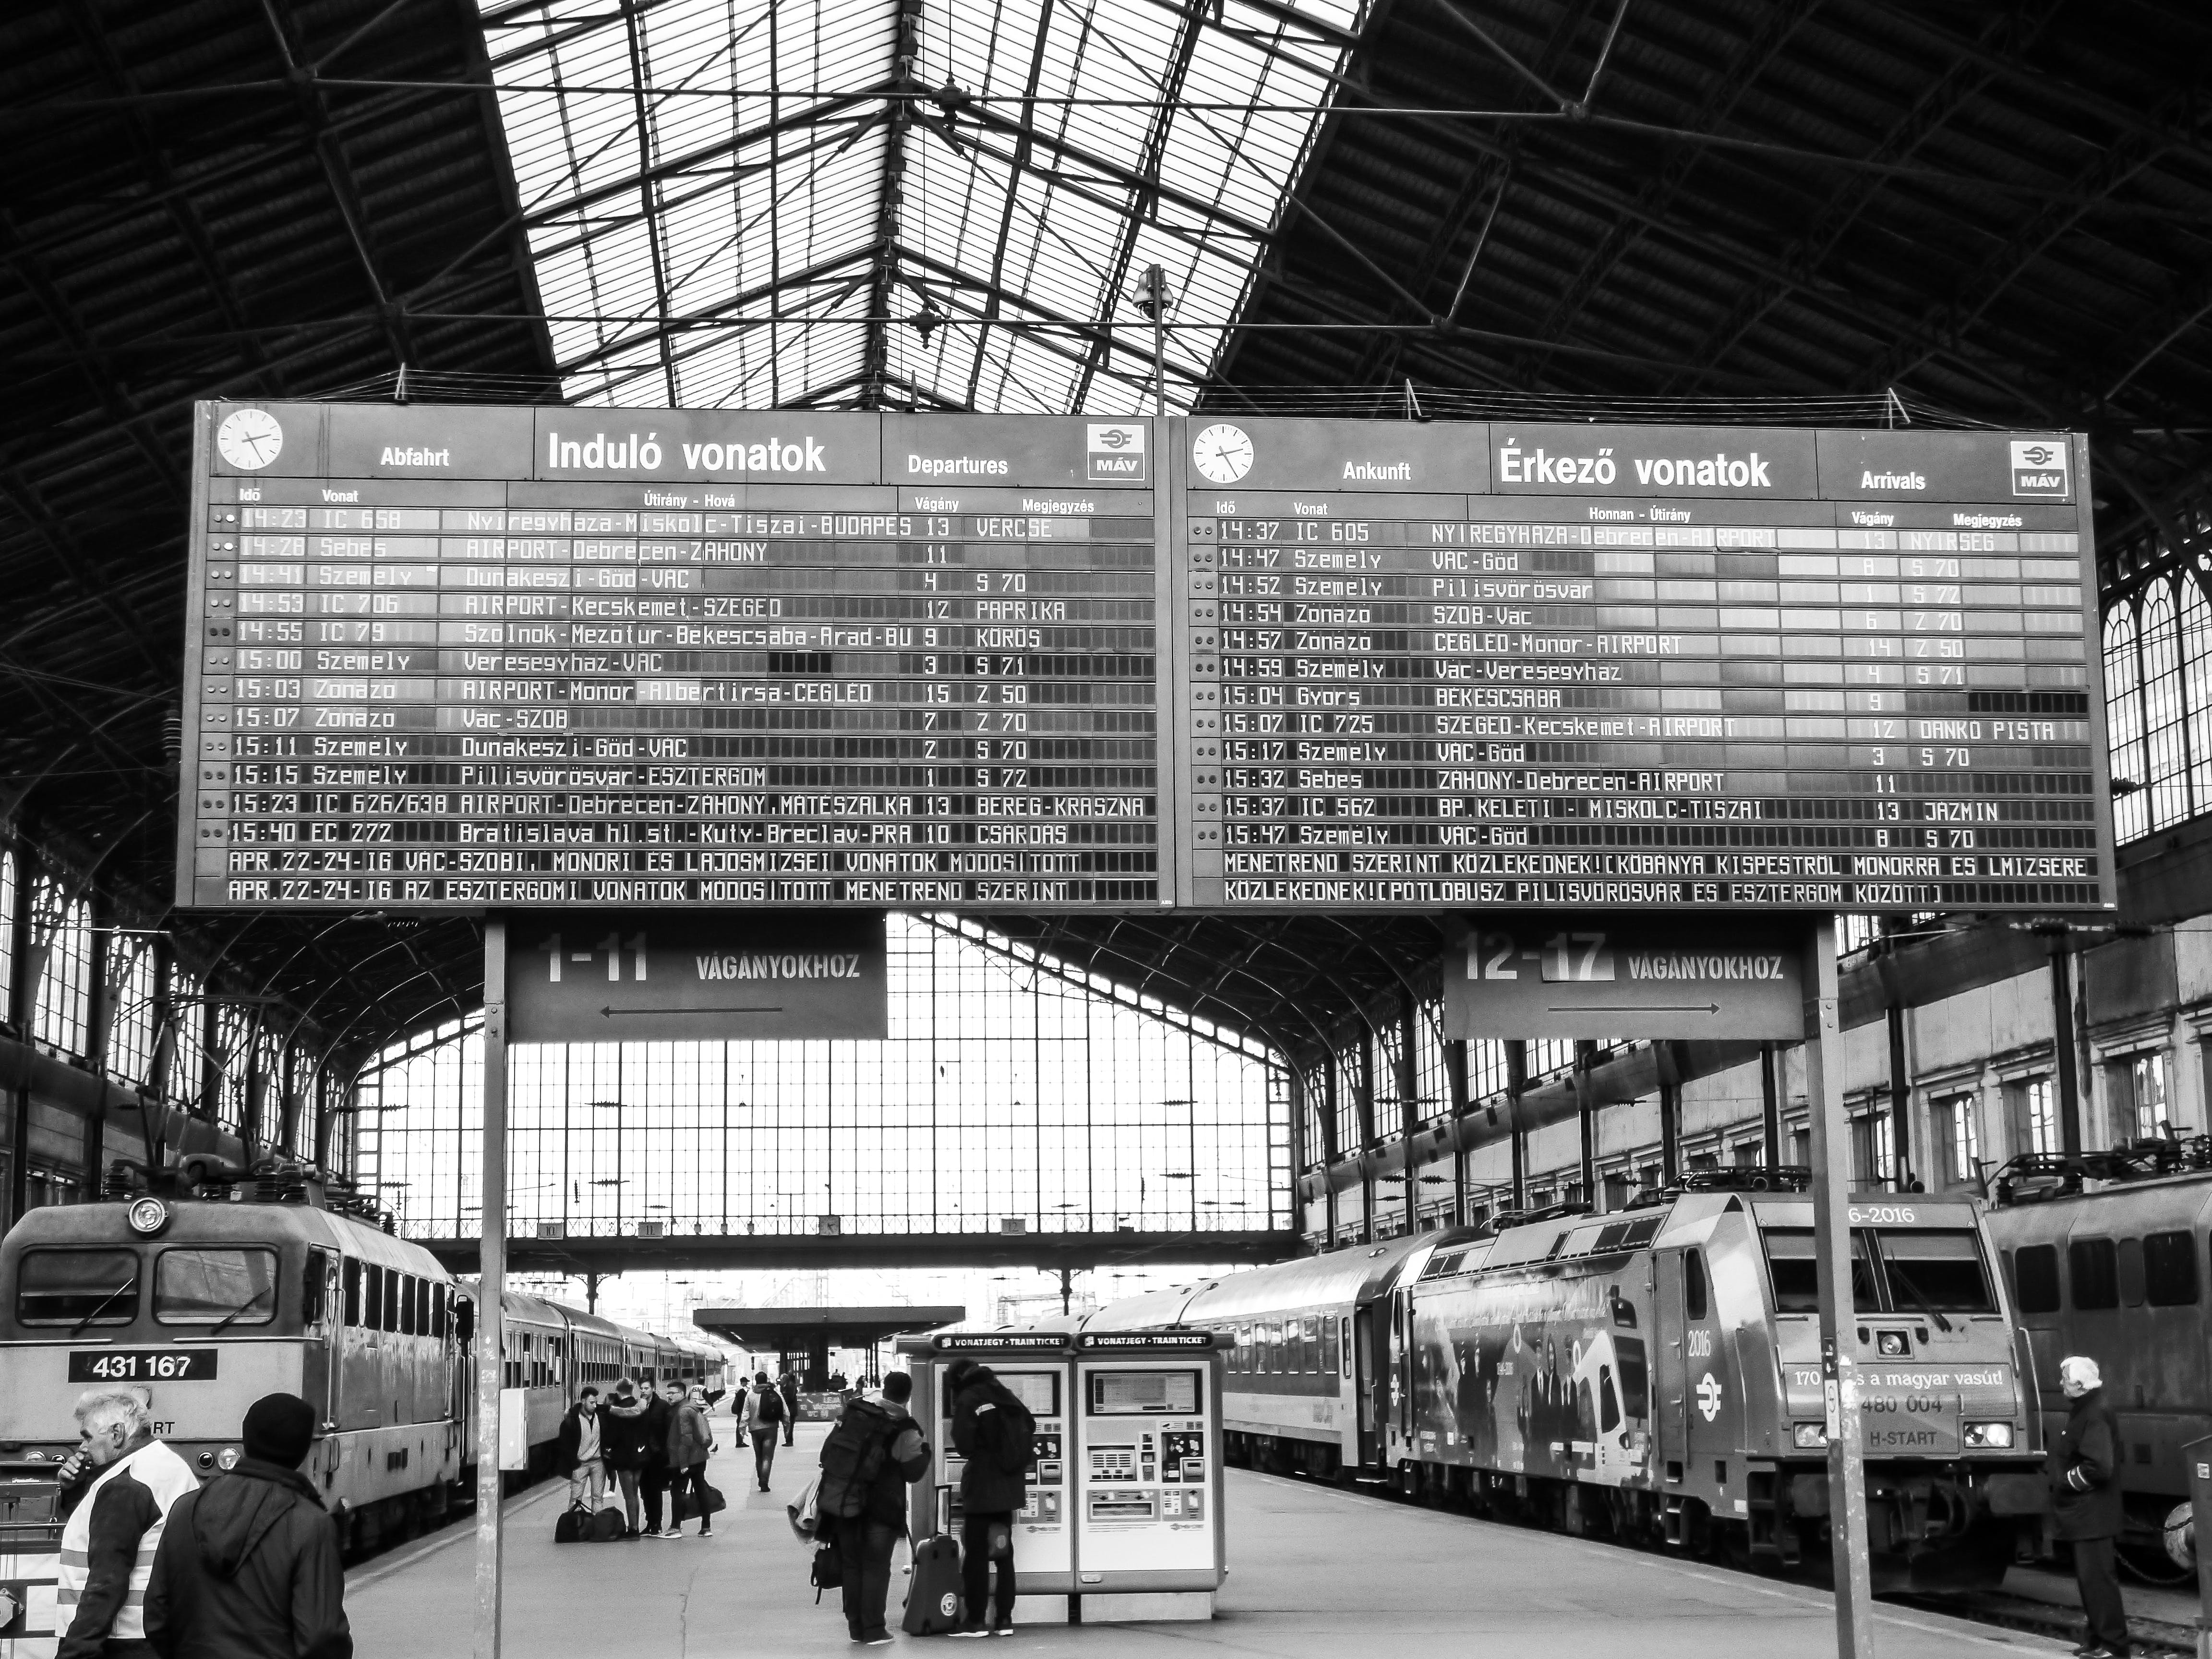 Train Station Signage